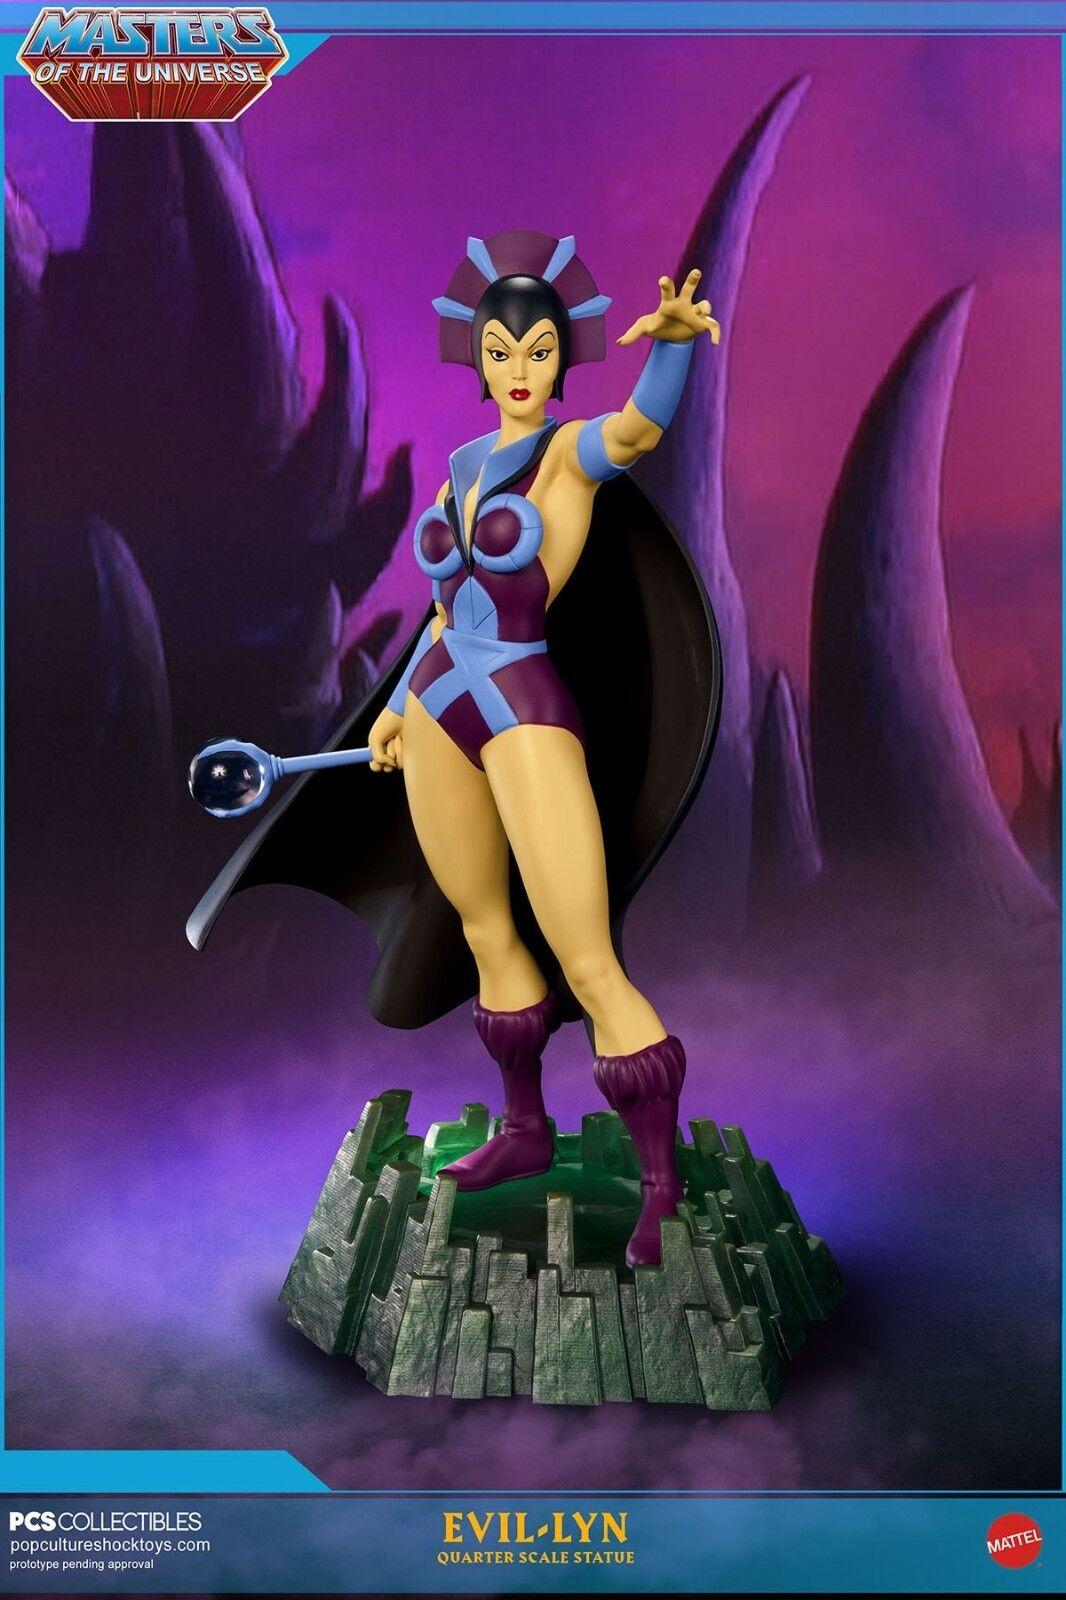 Masters Of The Universe    Evil-Lyn 1 4 Scale Statue Pop Culture Shock Sammler d189b2